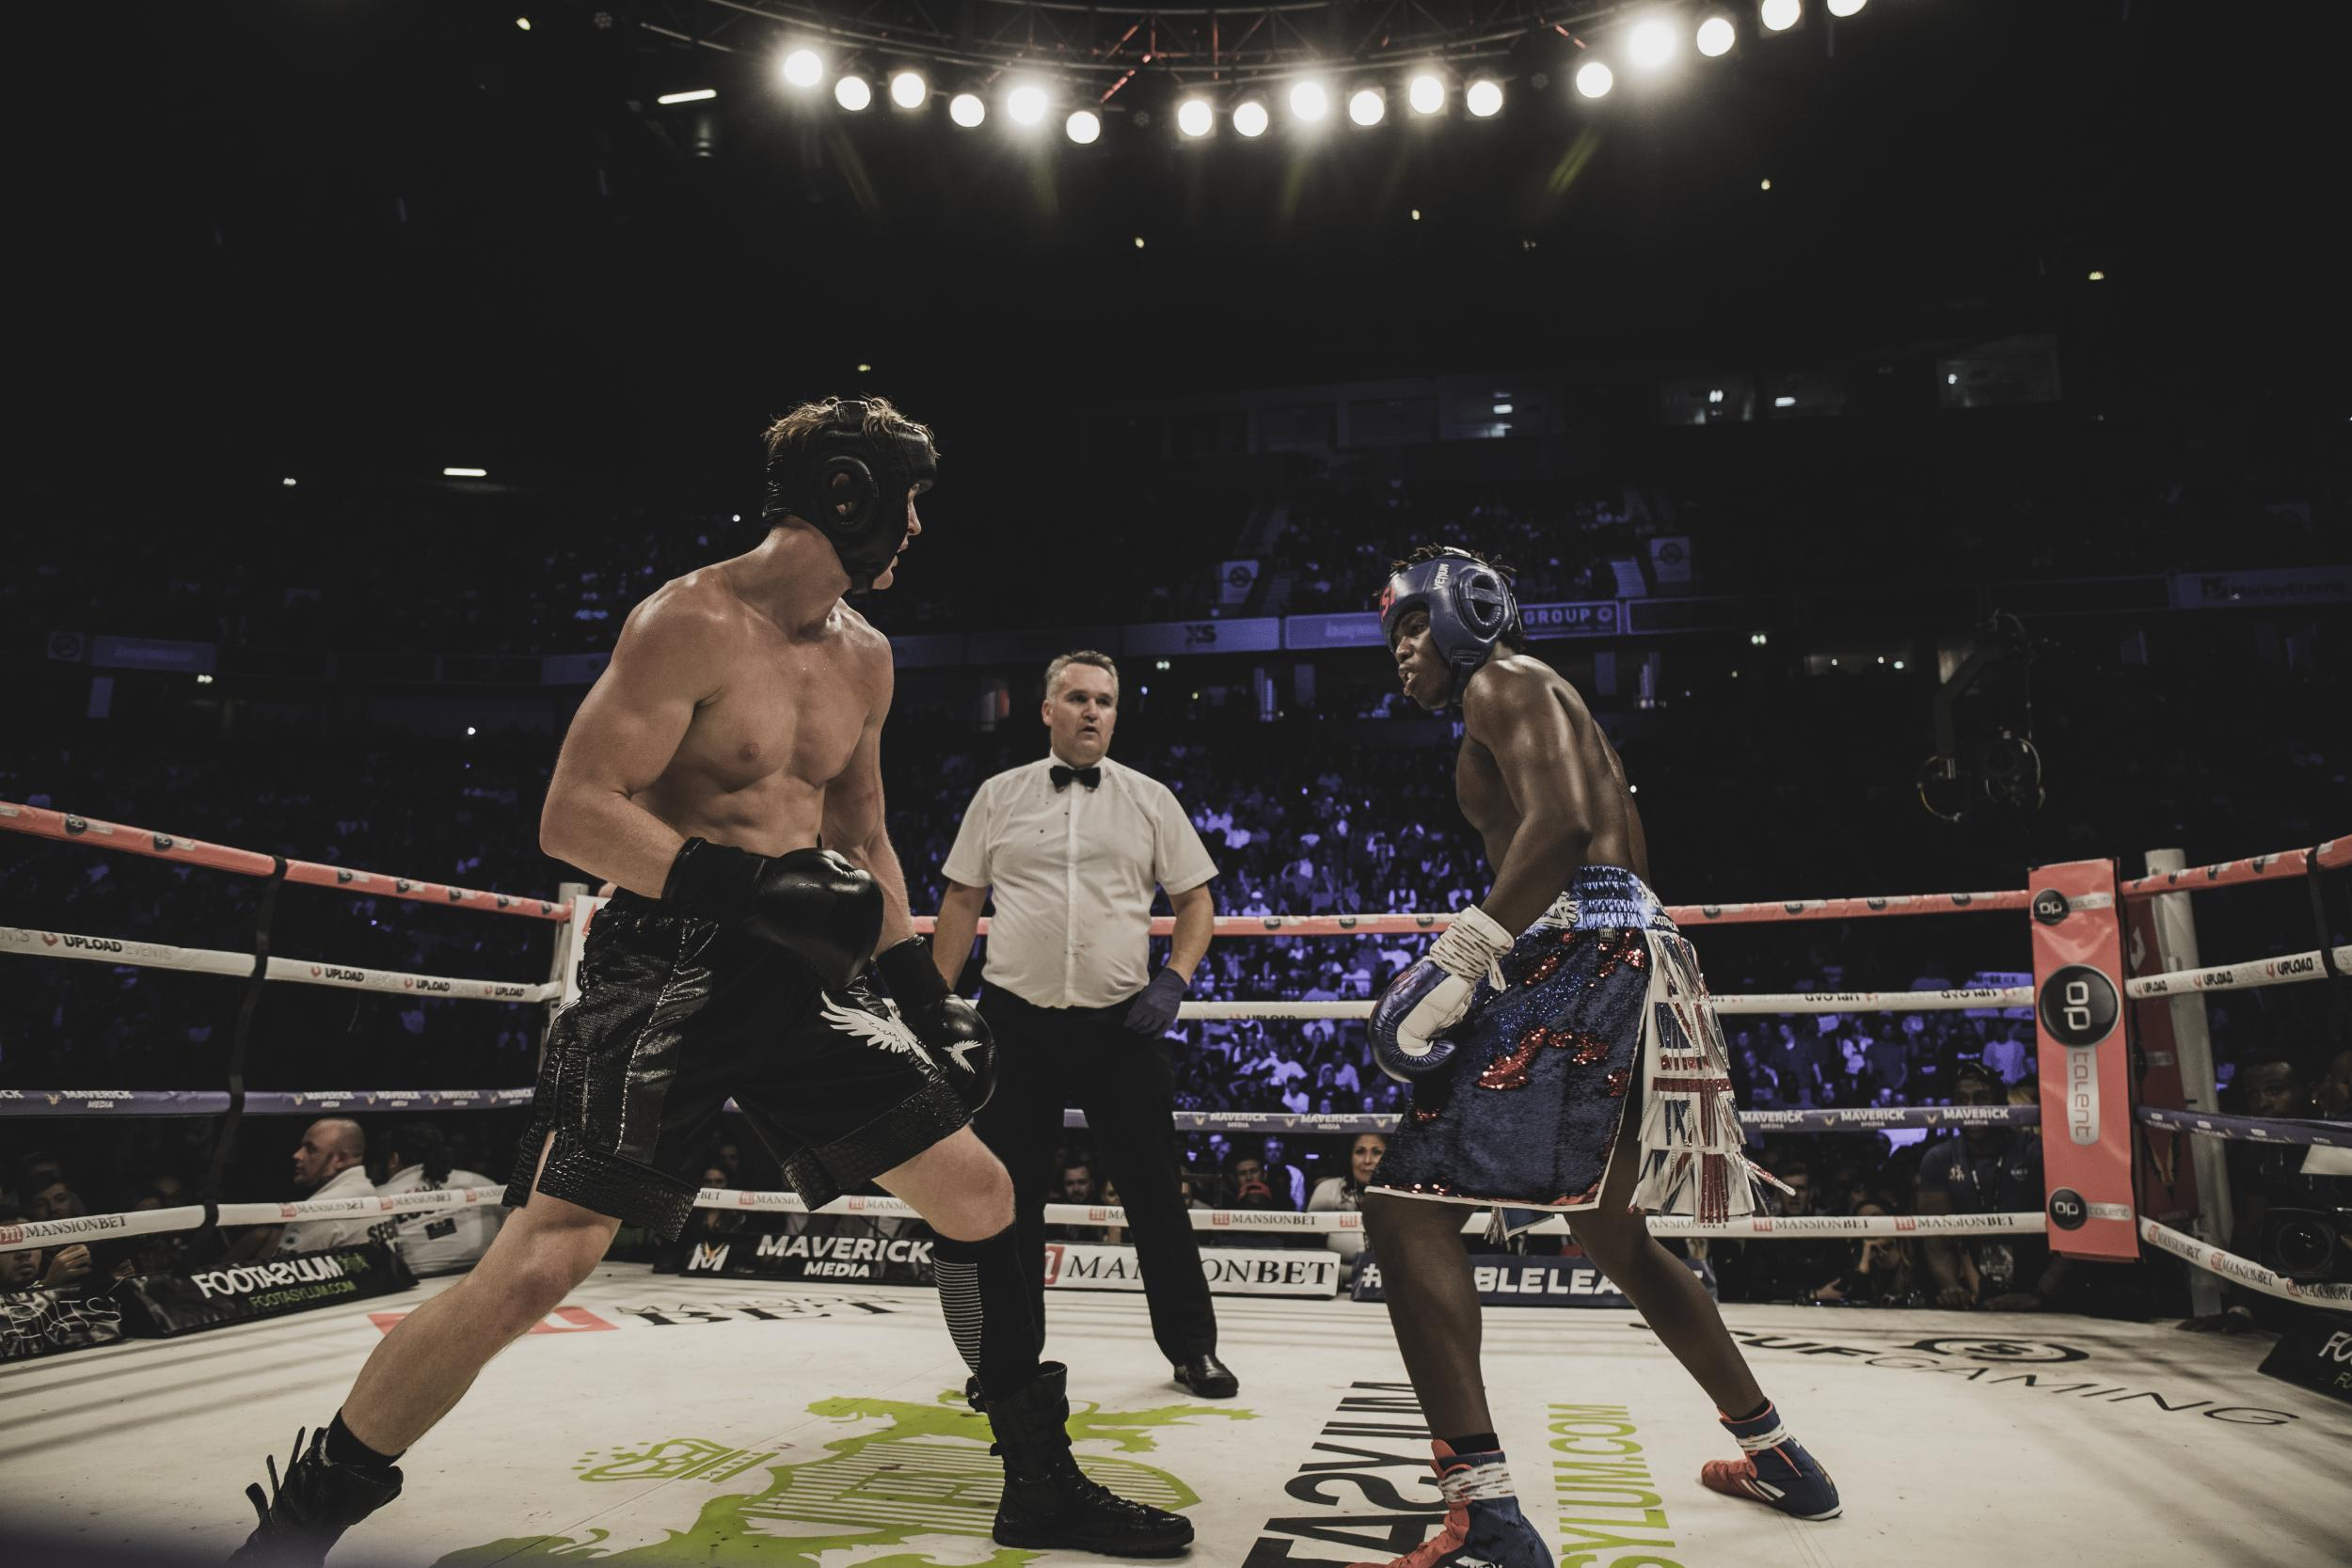 KSI vs Logan Paul rematch: Date, tickets, undercard, where